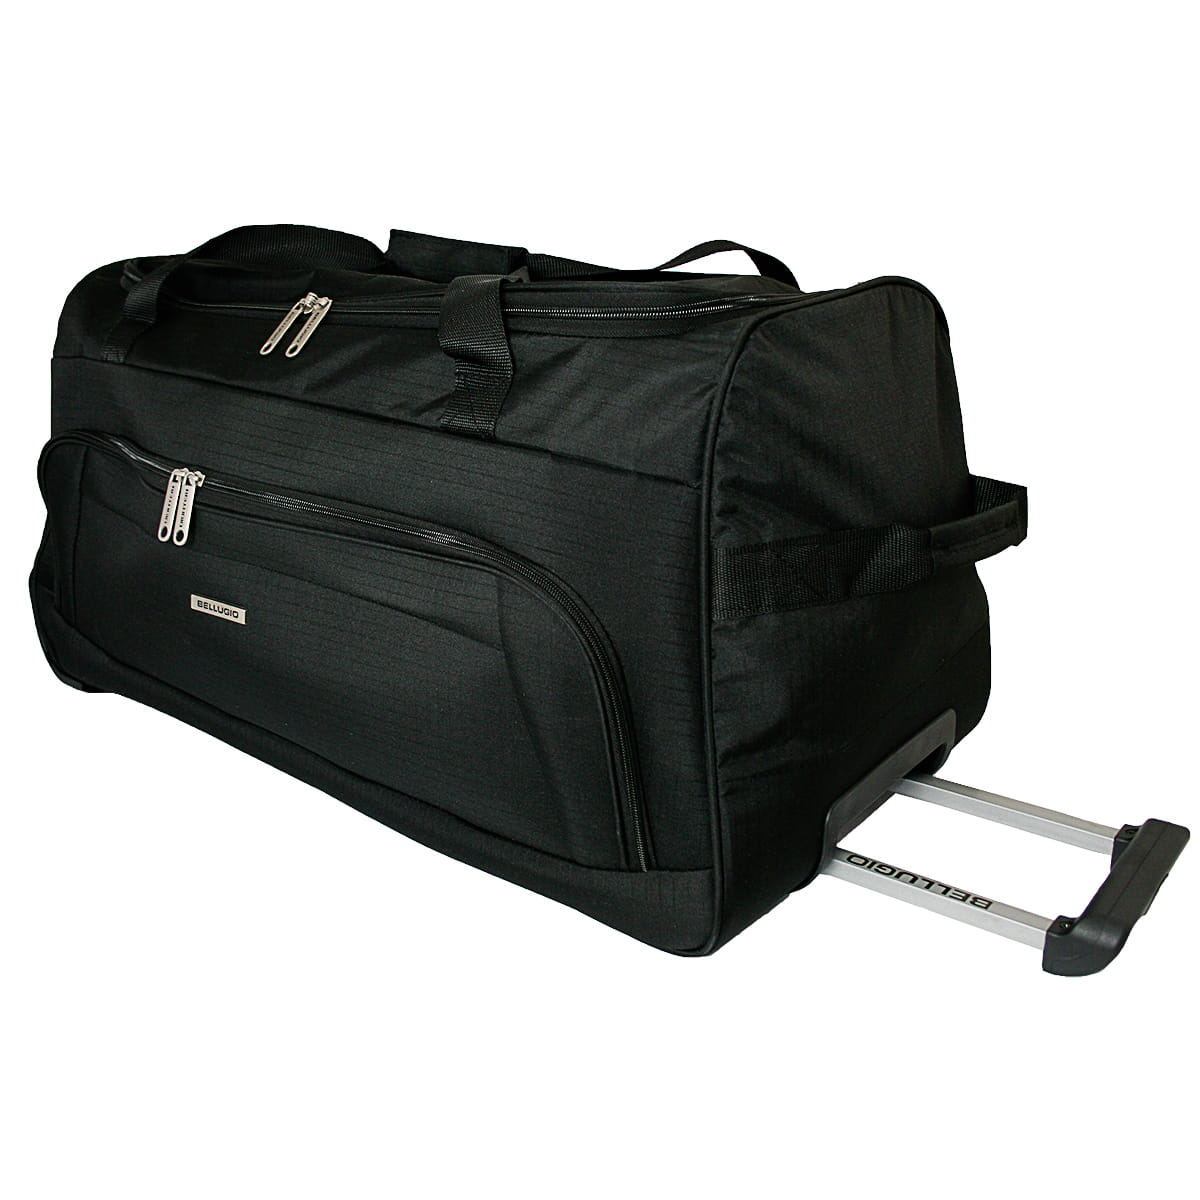 48632b57b8048 Duża torba podróżna na kółkach Bellugio